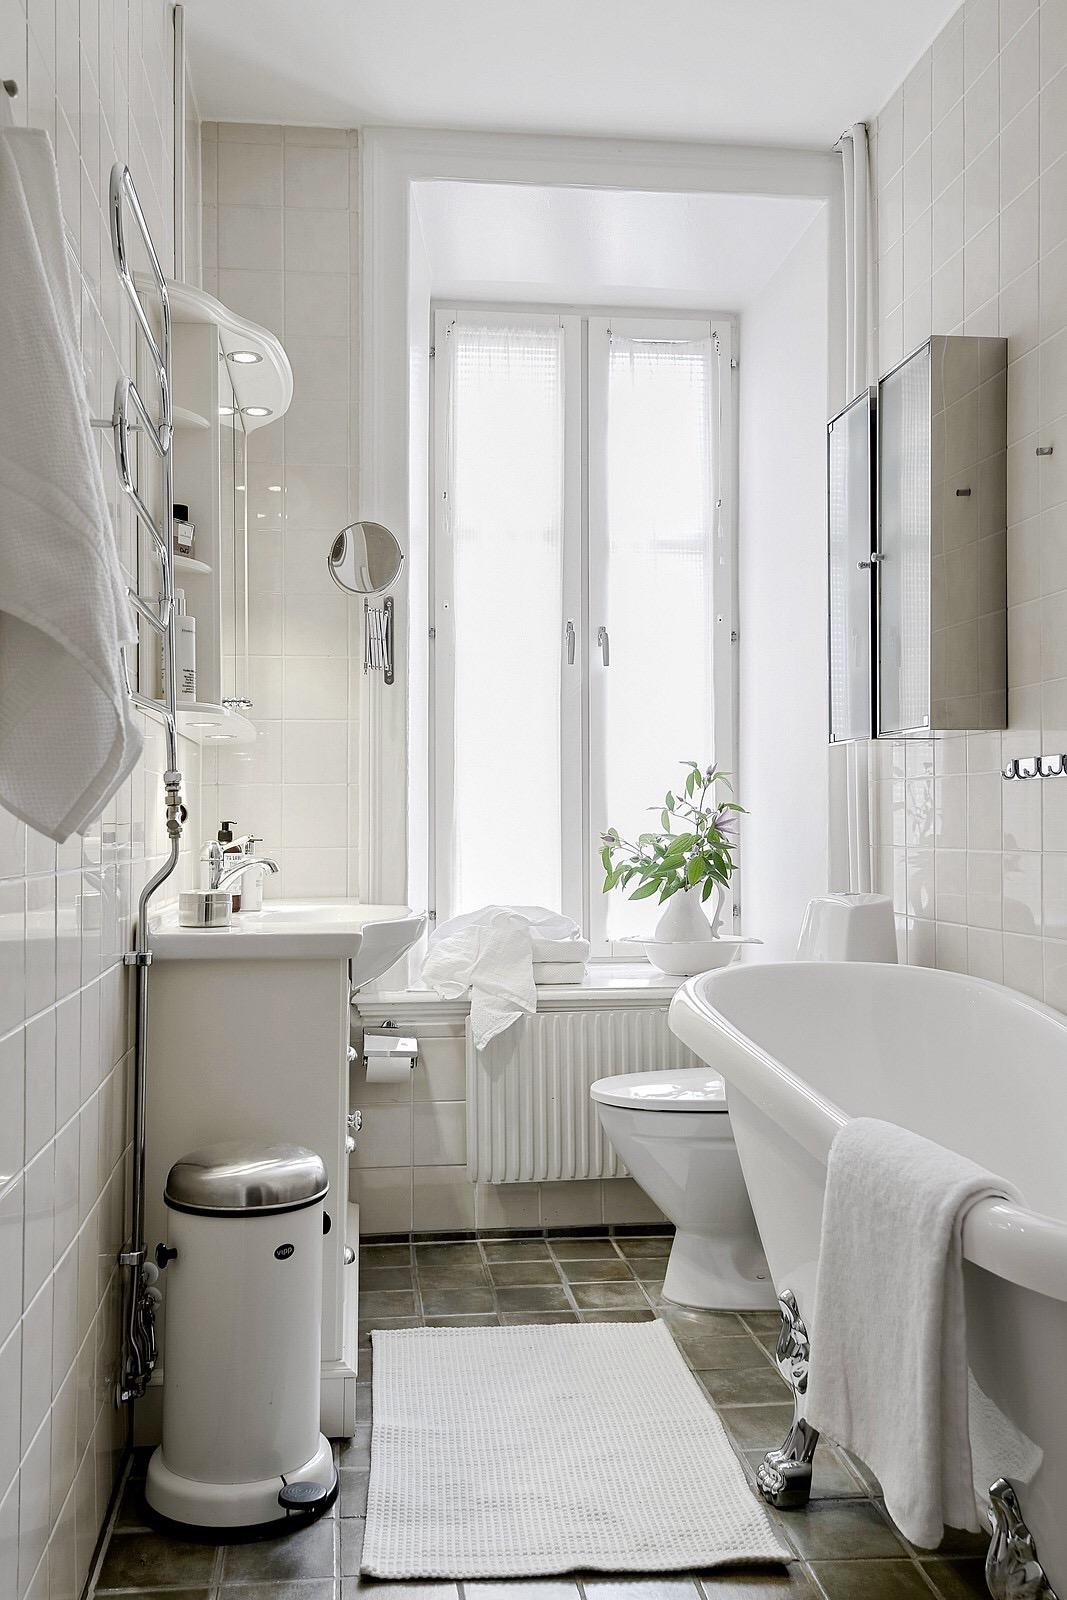 санузел окно ванна раковина зеркало шкафчик